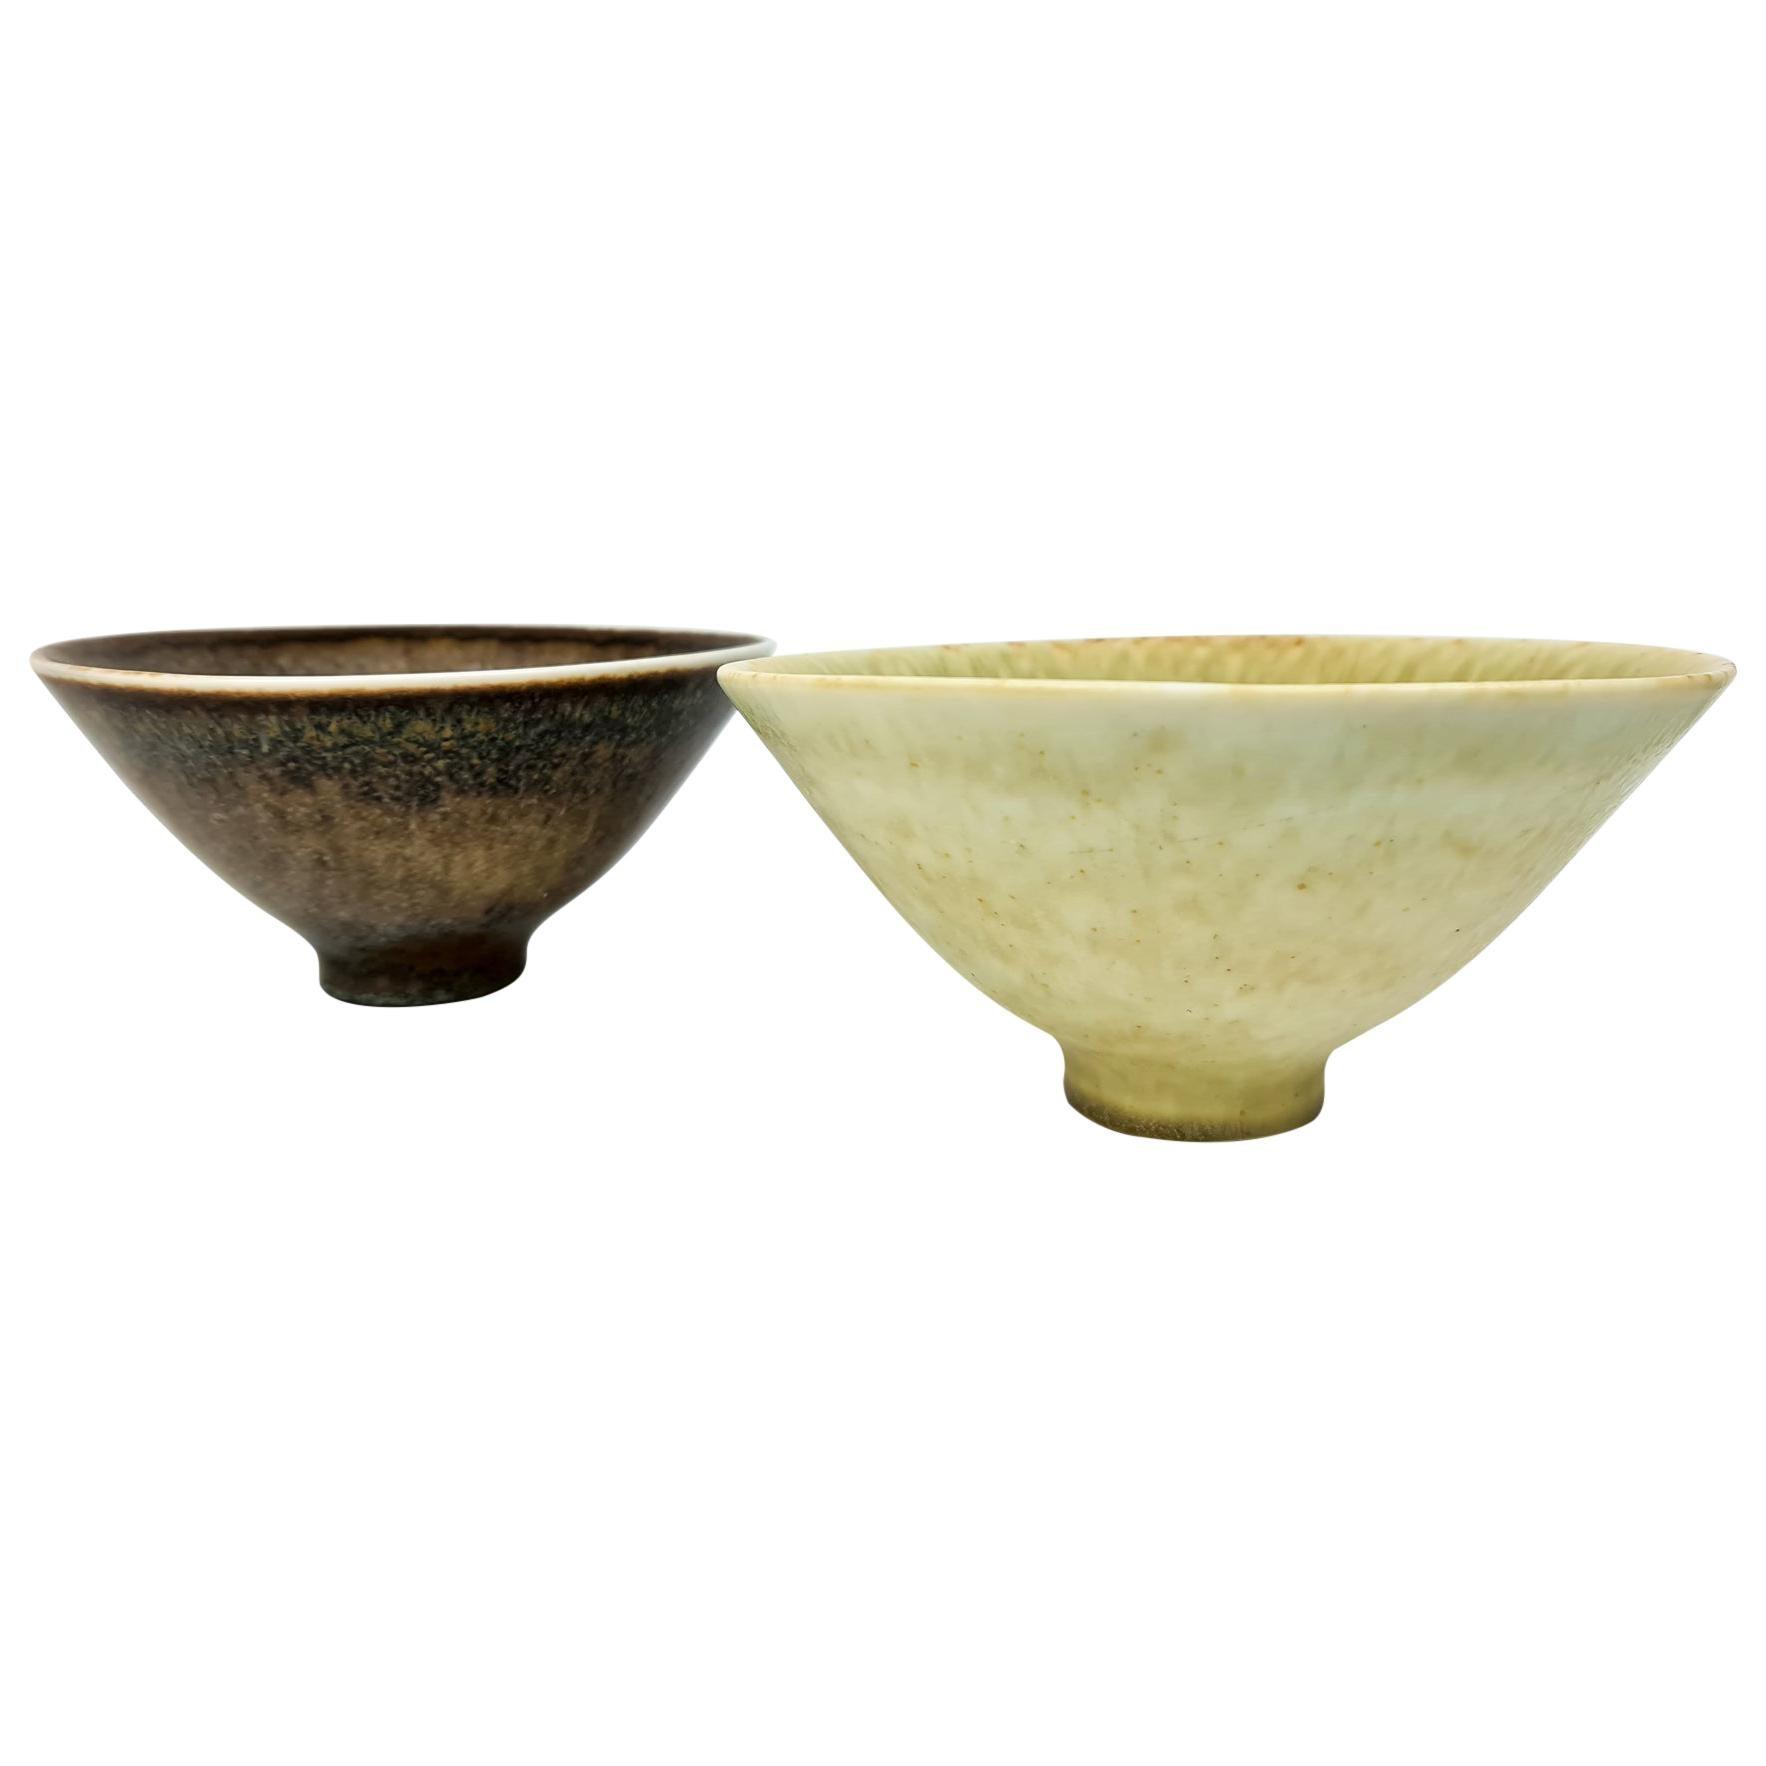 Midcentury Pair of Ceramic Bowls Carl-Harry Stålhane Rörstrand, Sweden, 1950s